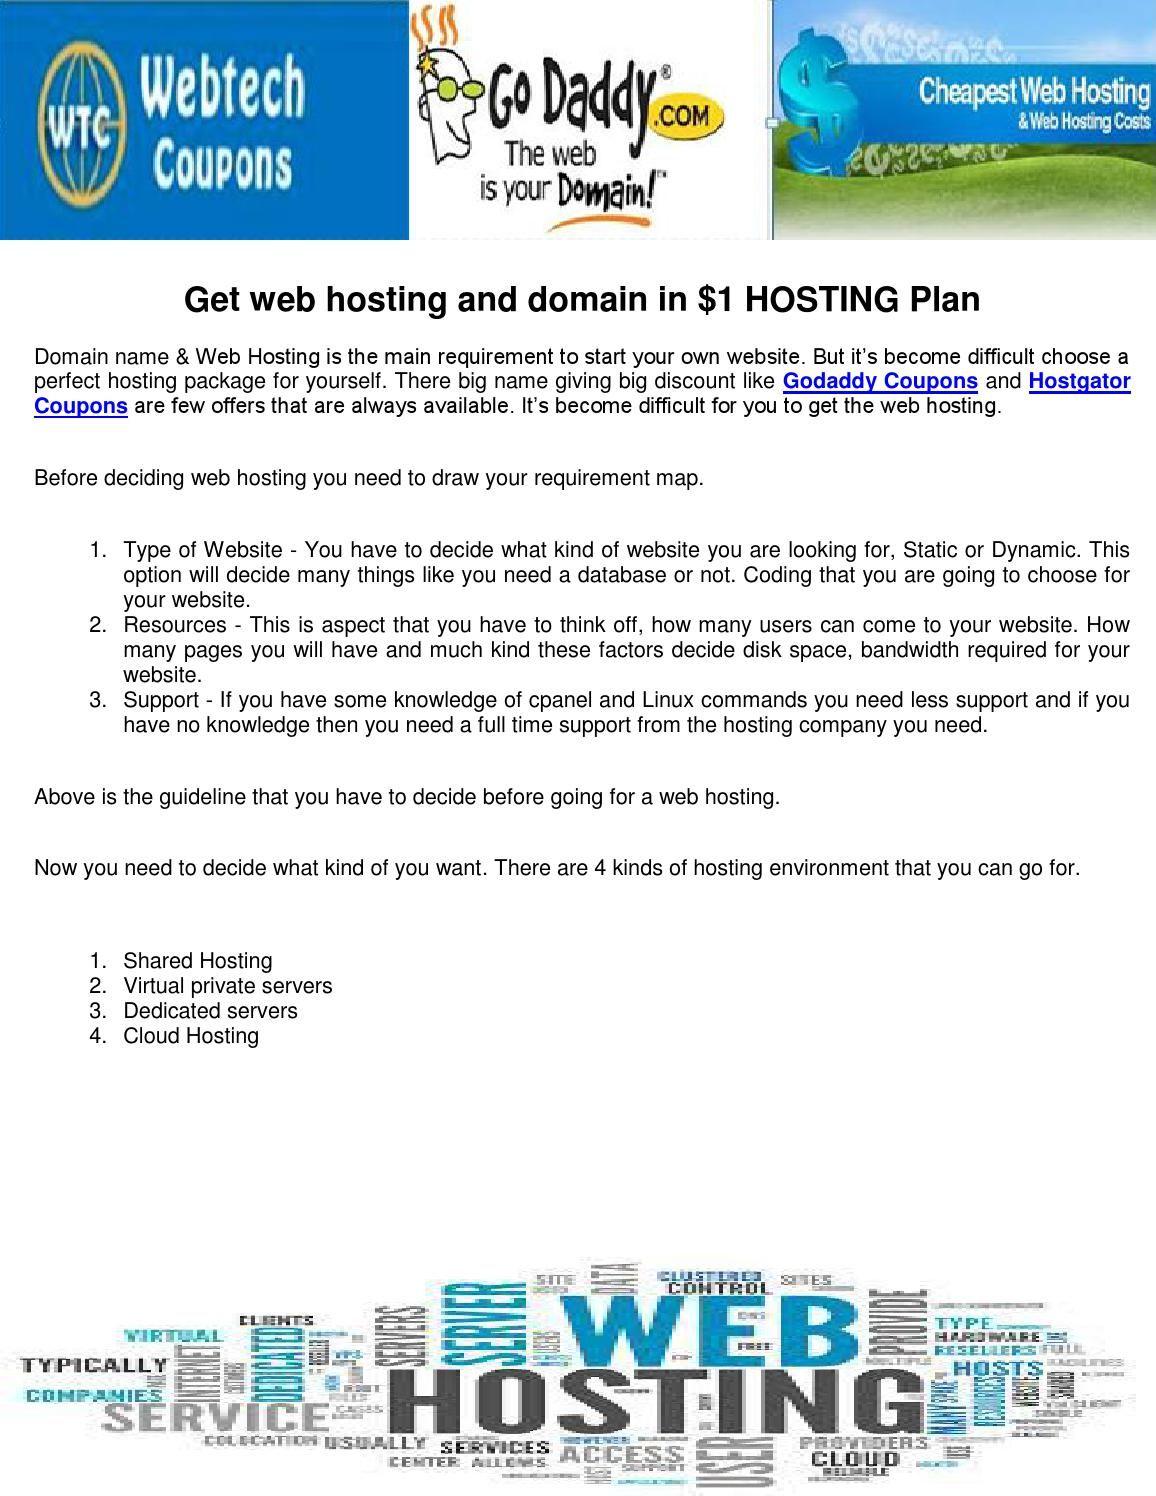 Cheapest Web Hosting And Domain Web Hosting Web Hosting Services Hosting